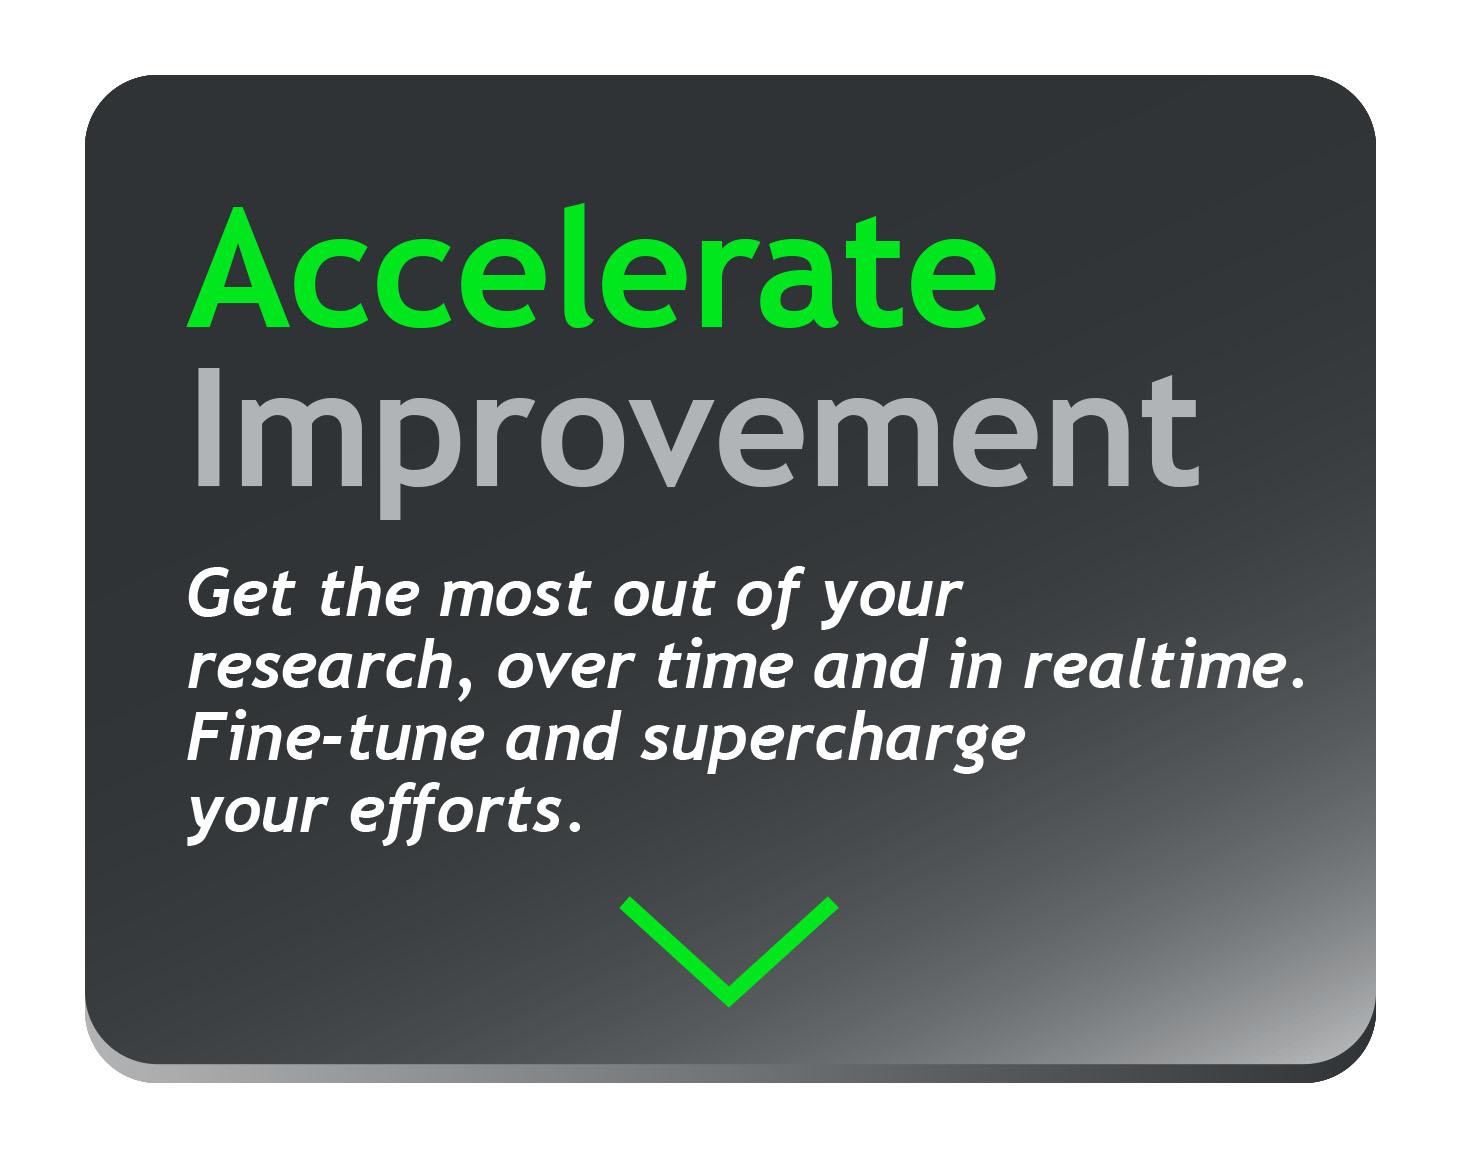 accellerate-improvement2.jpg